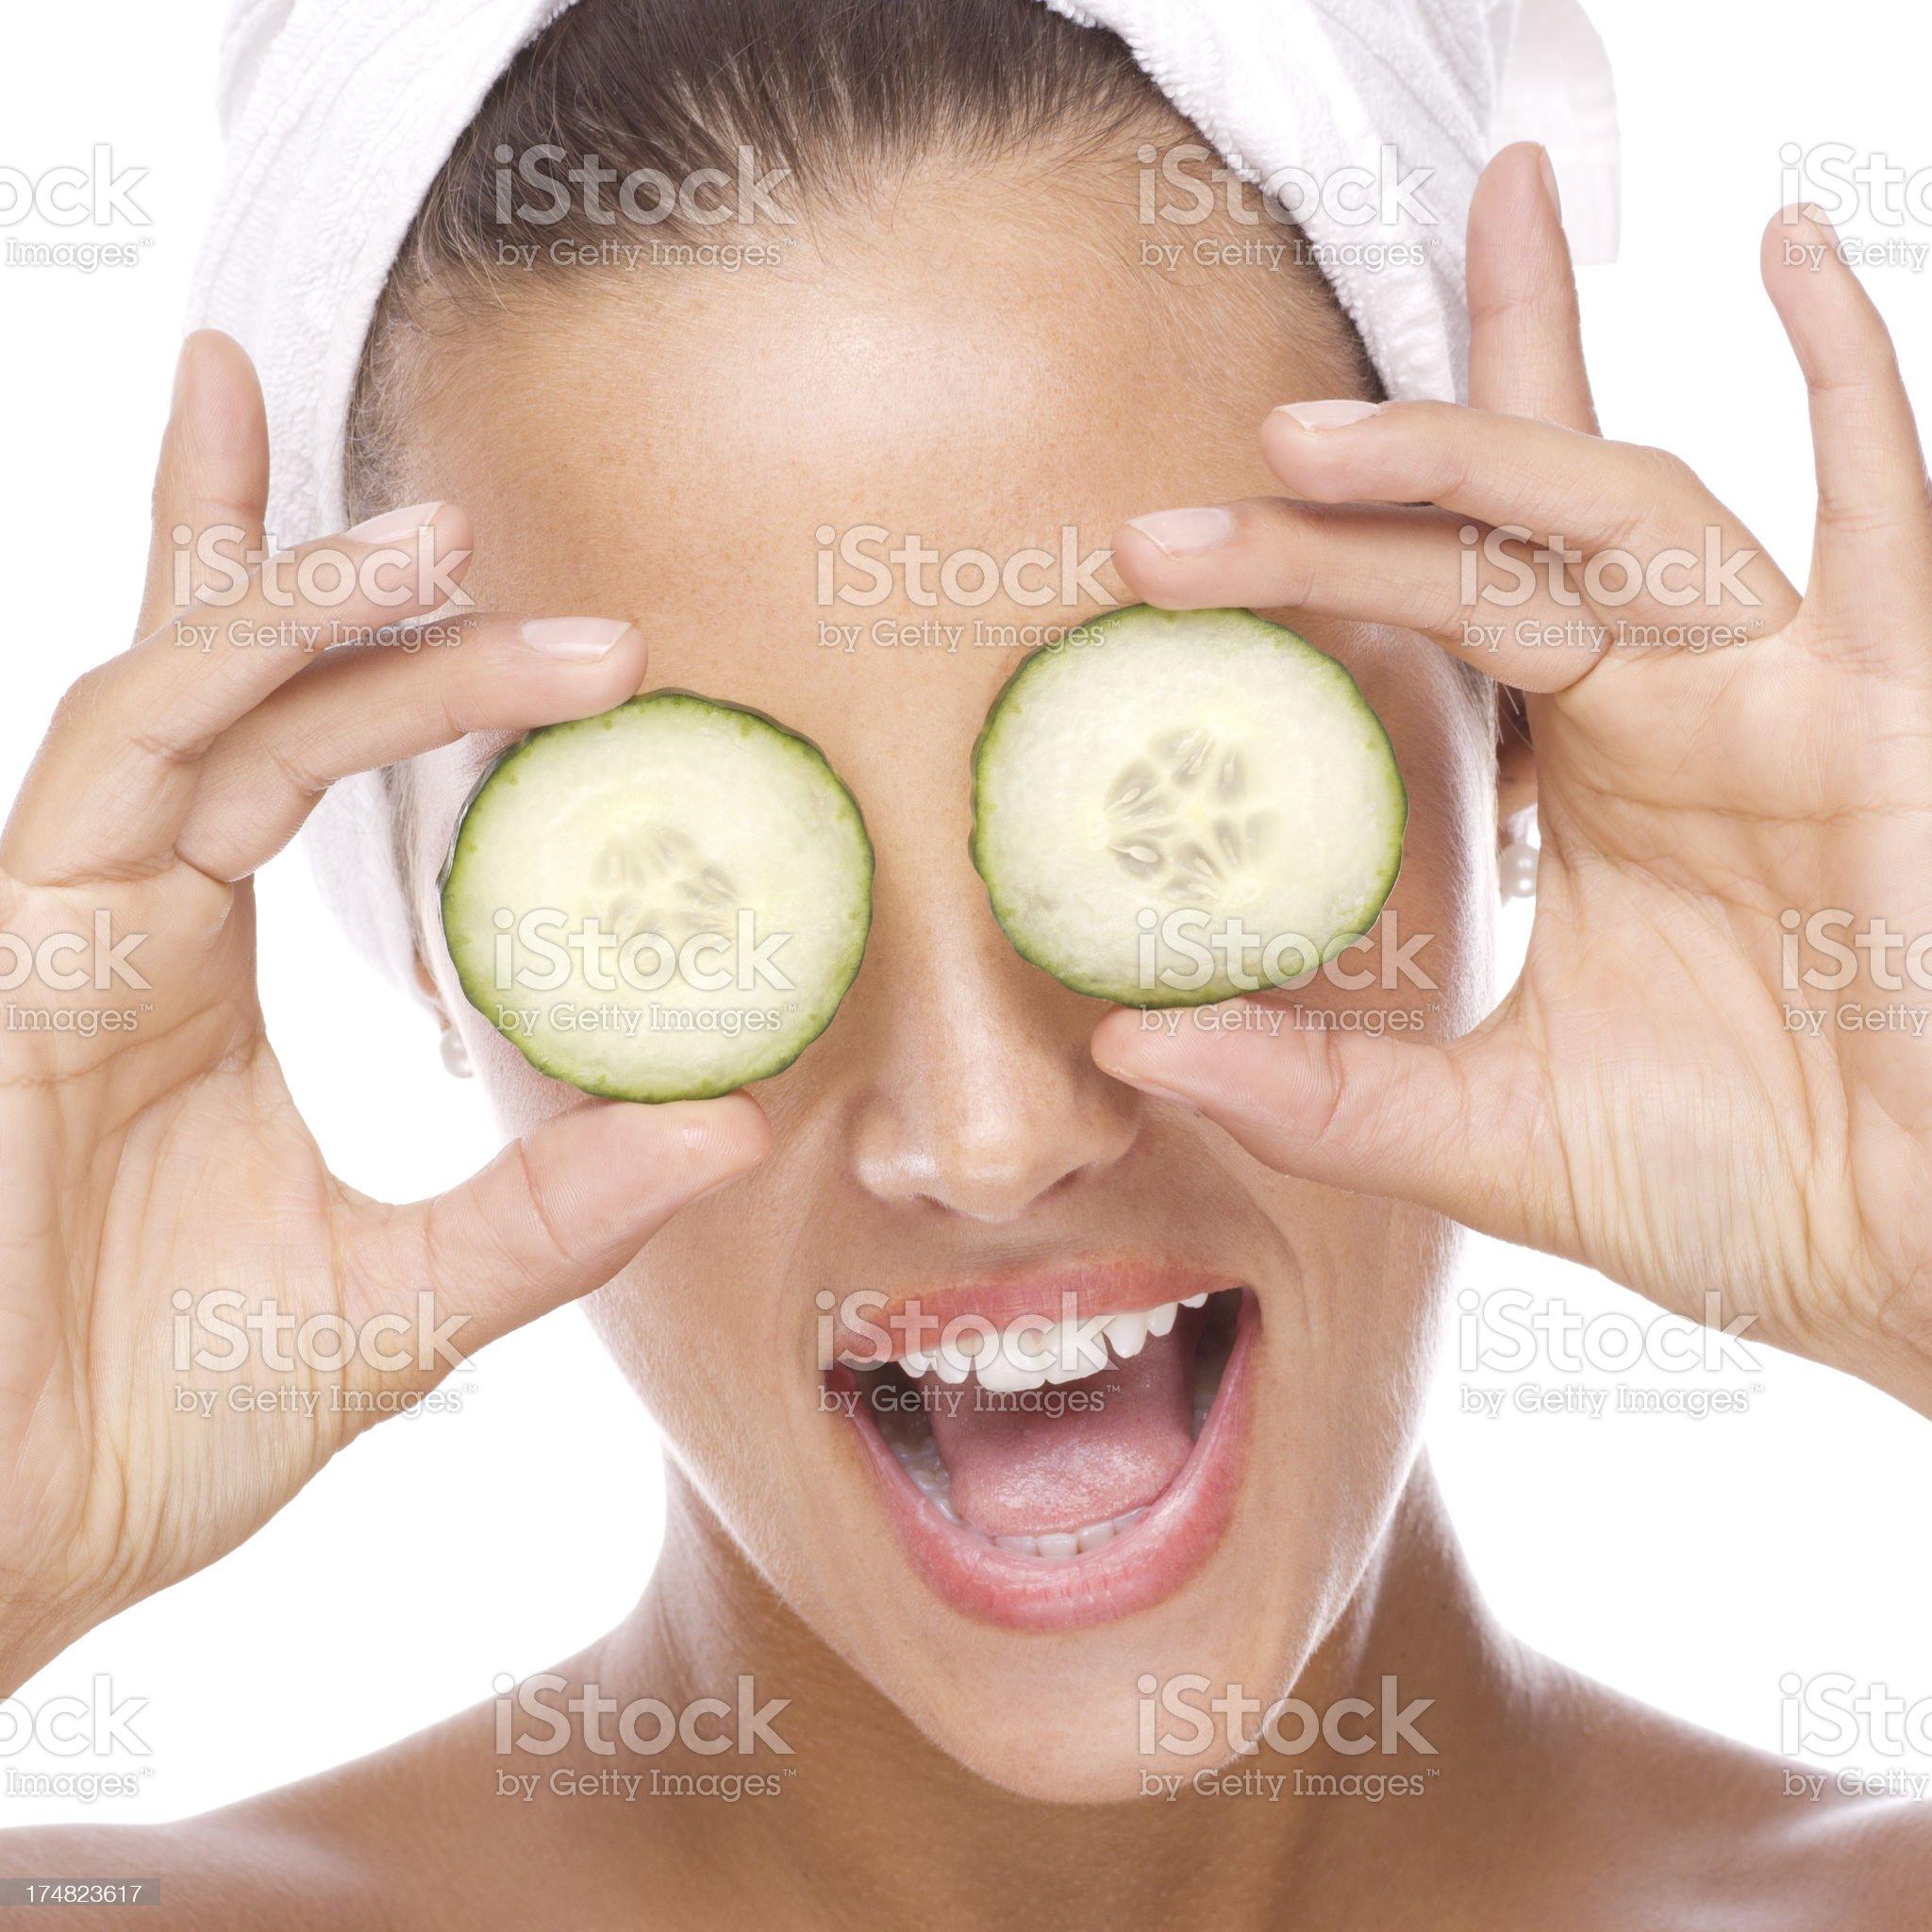 Cucumber eyes - facial mask. royalty-free stock photo